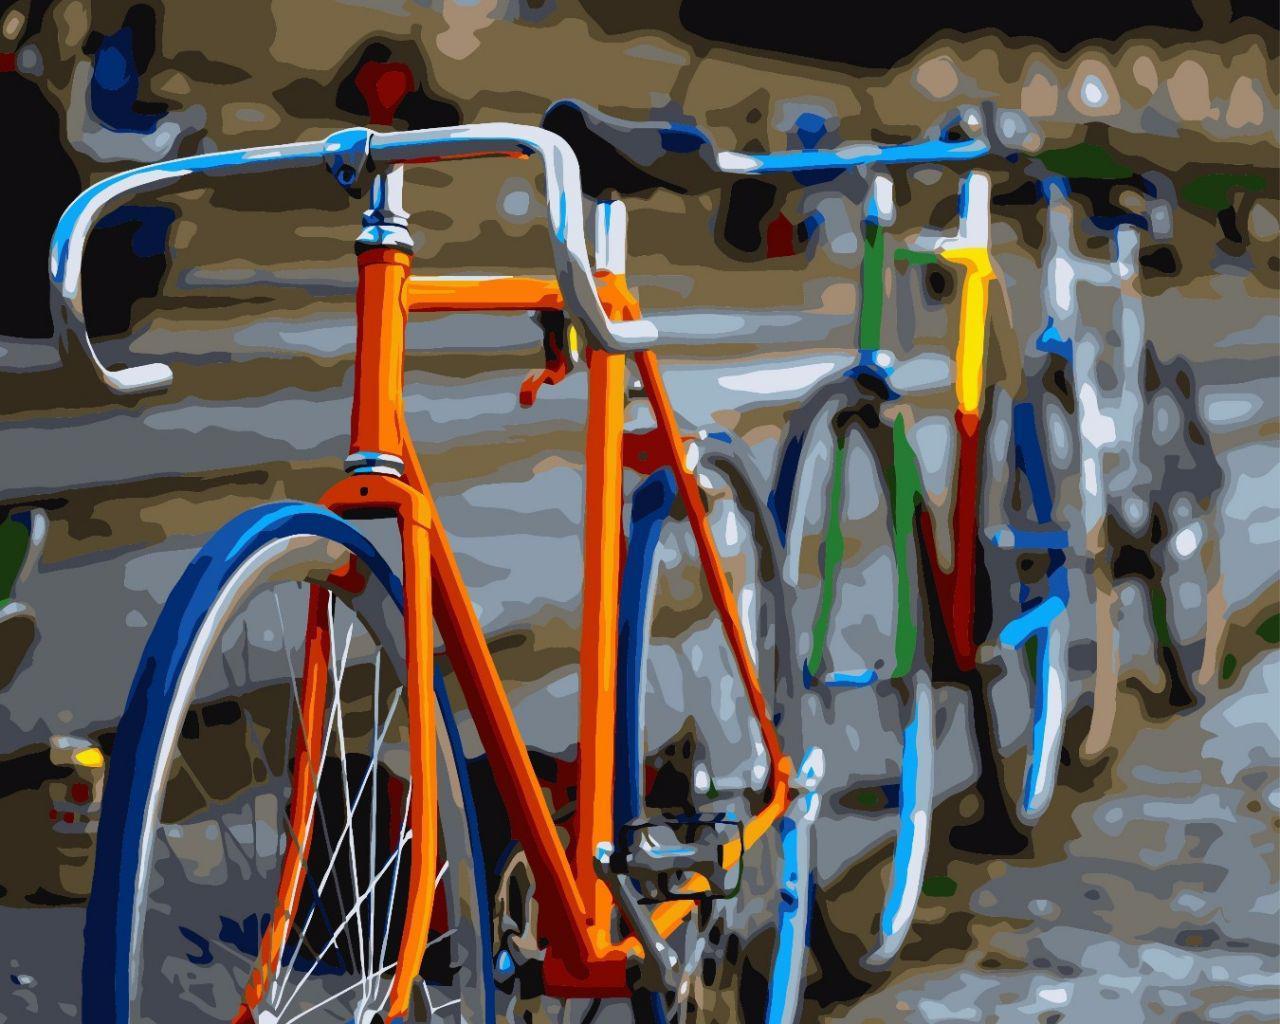 Картина по номерам Велосипеды, 40x50 см., Brushme